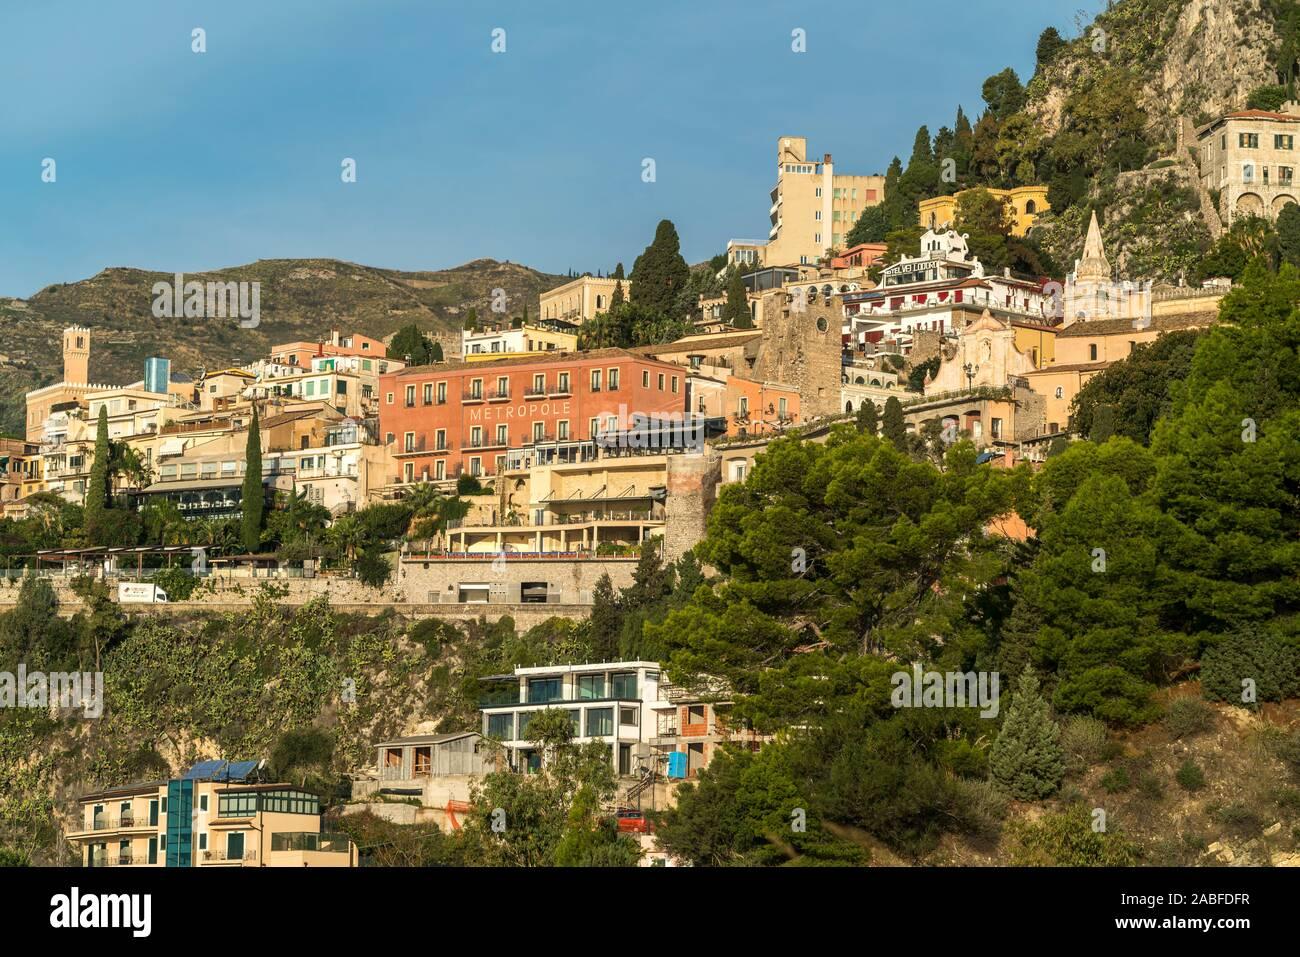 Taormina, Sizilien, Italien, Europa  |  Taormina, Sicily, Italy, Europe Stock Photo